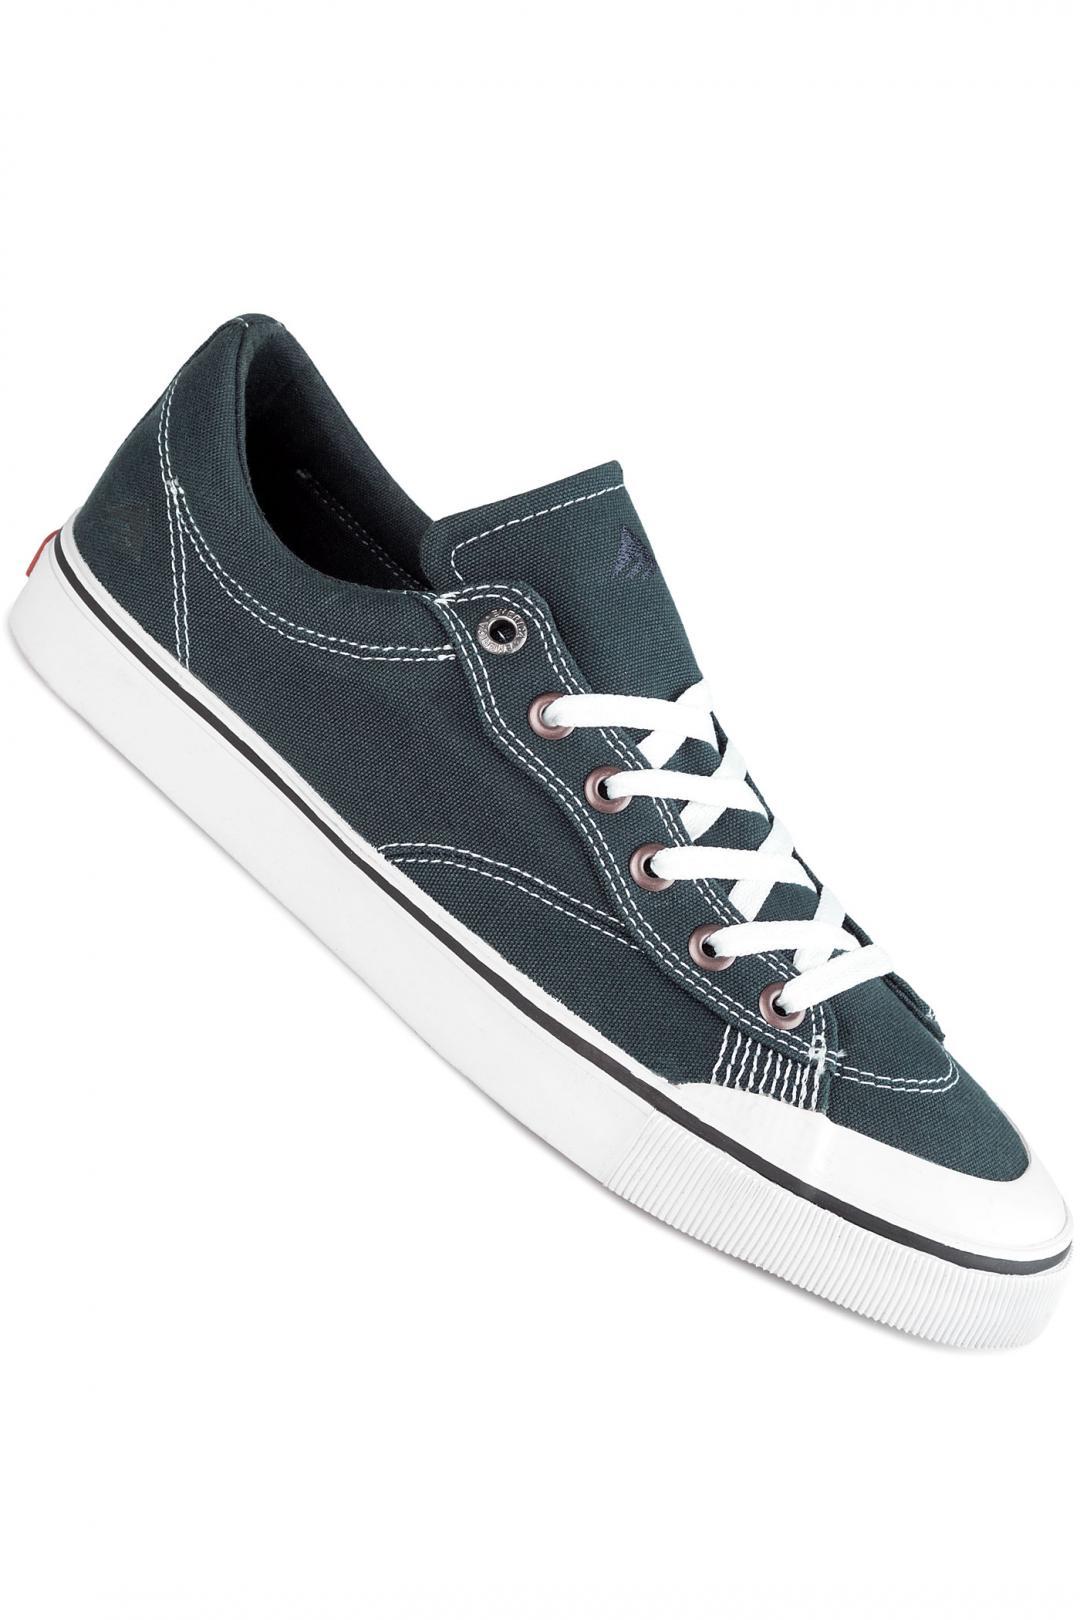 Uomo Emerica Indicator Low navy white | Sneakers low top